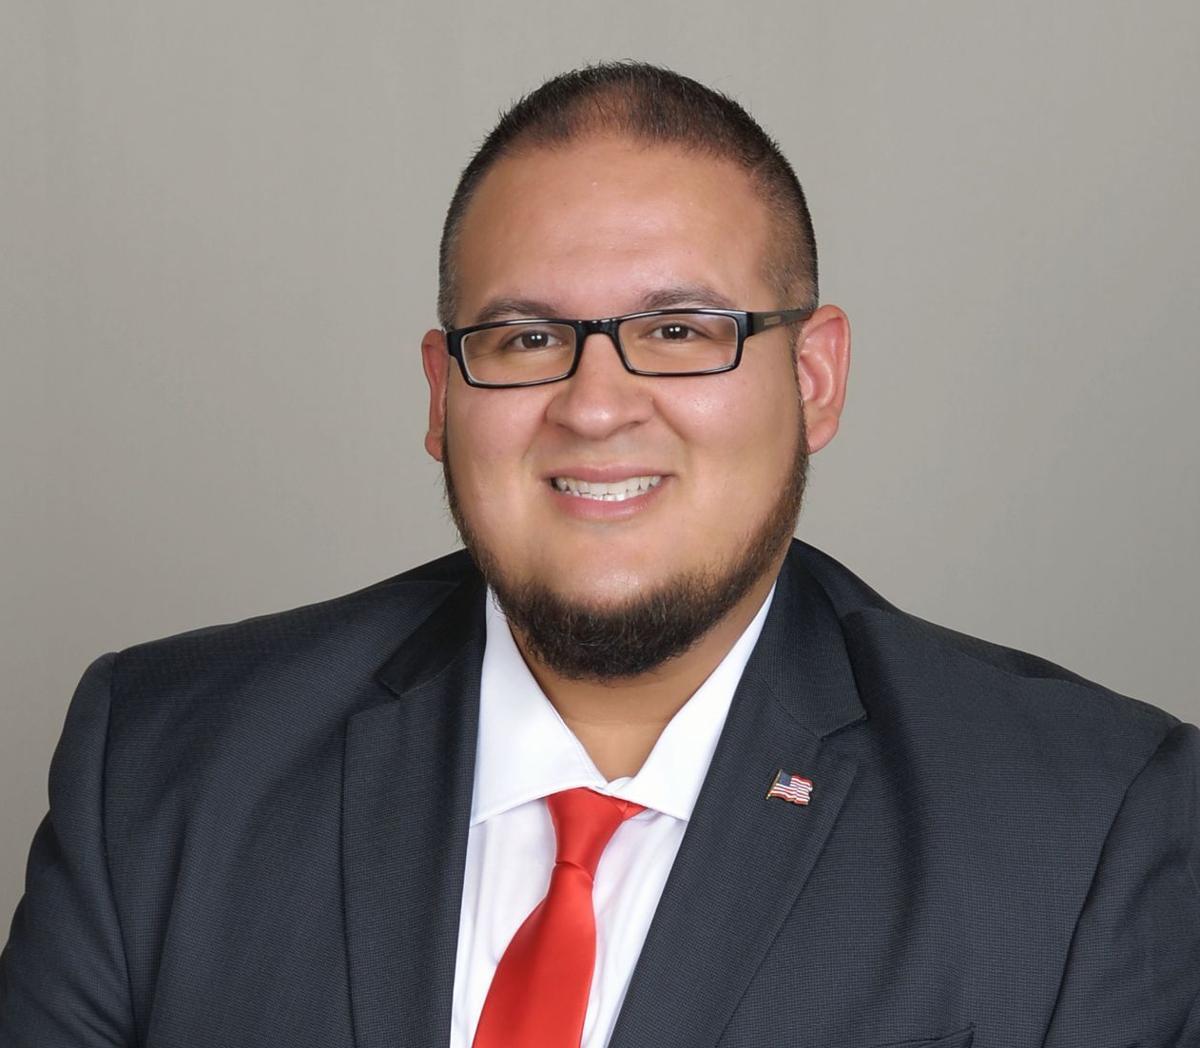 Mike Cruz